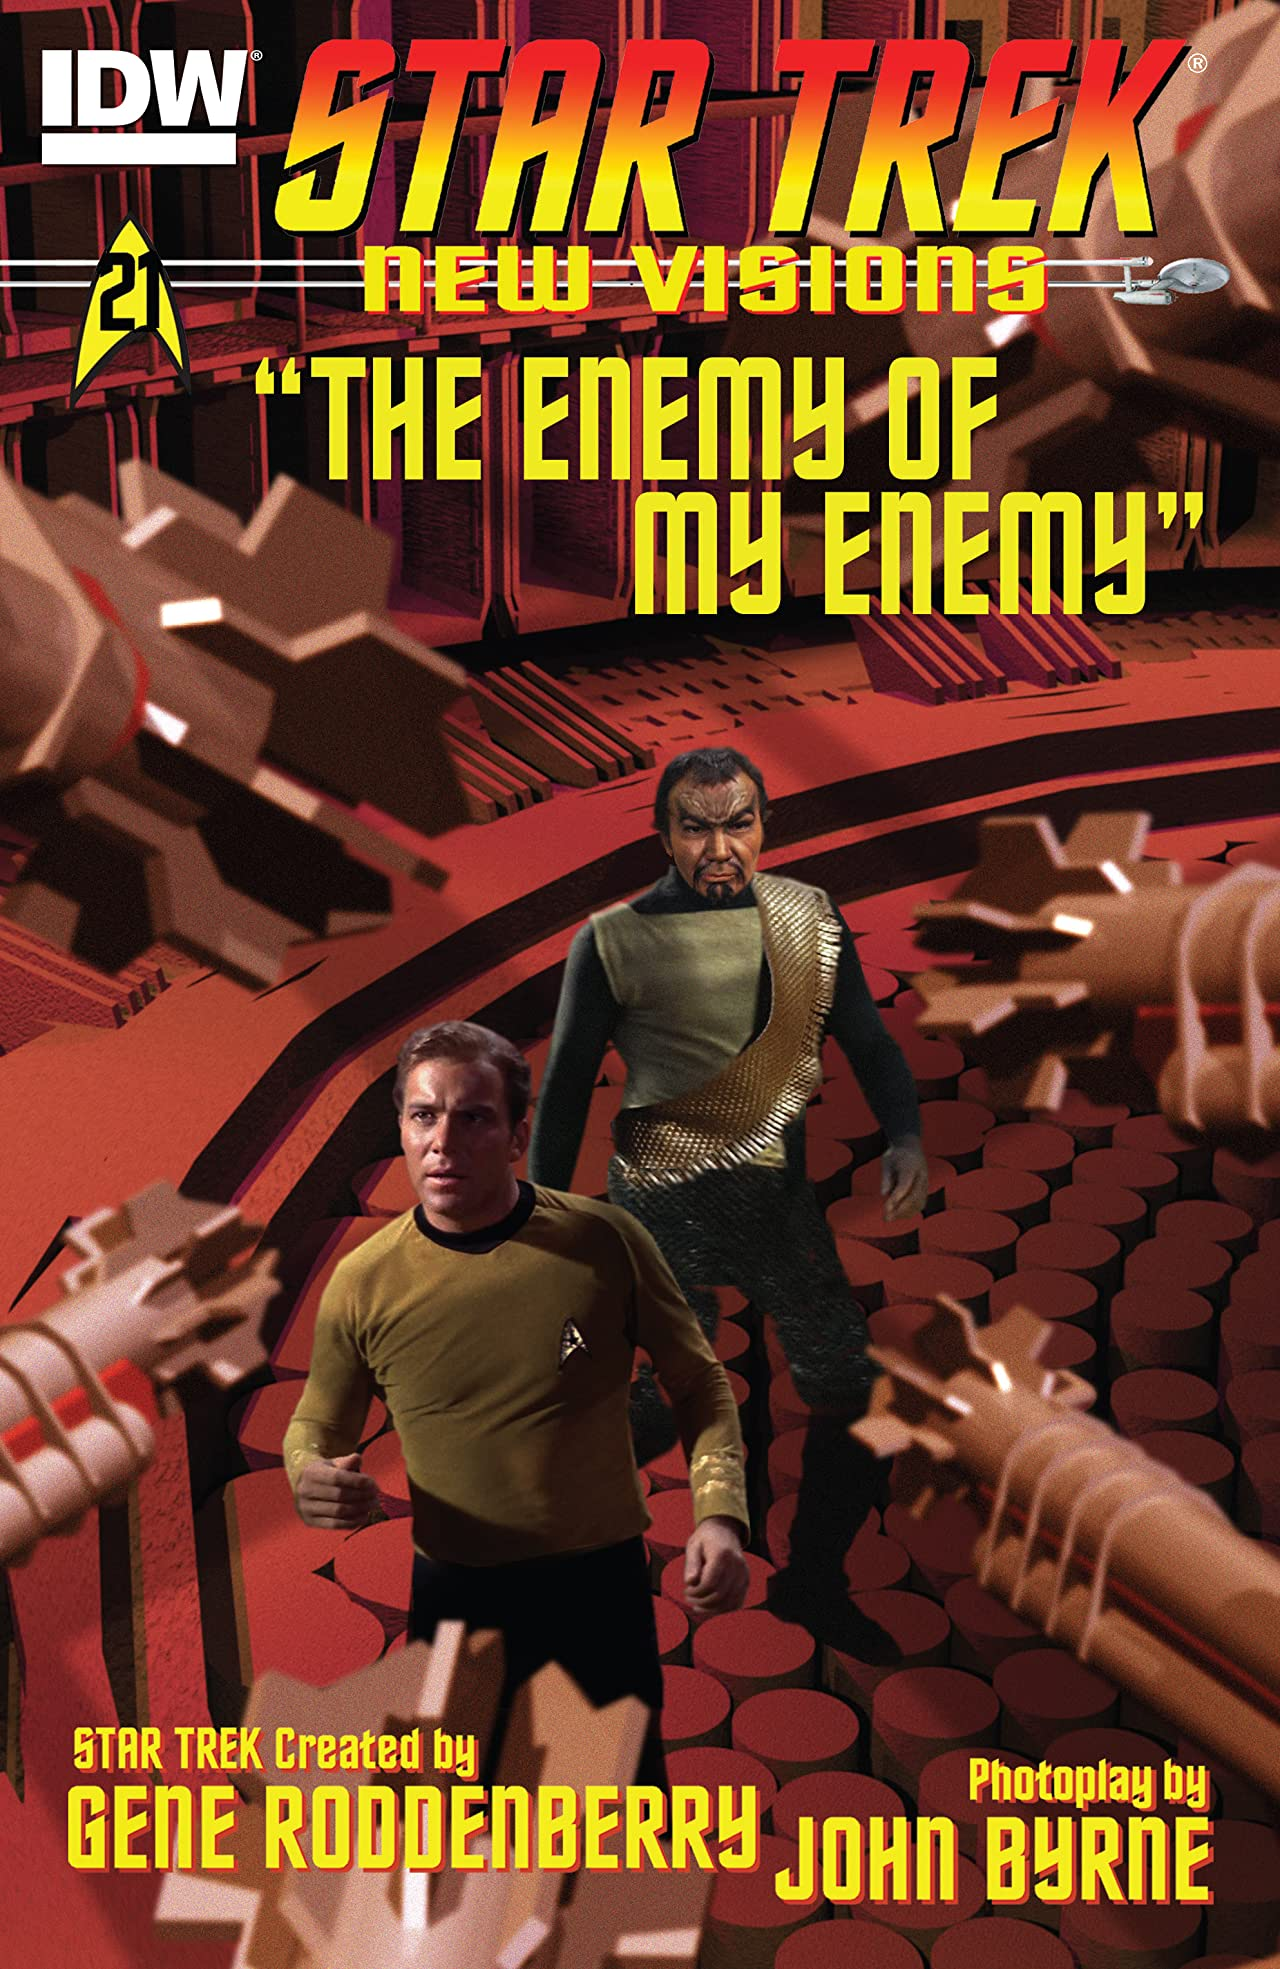 Star Trek: New Visions #21: The Enemy of My Enemy